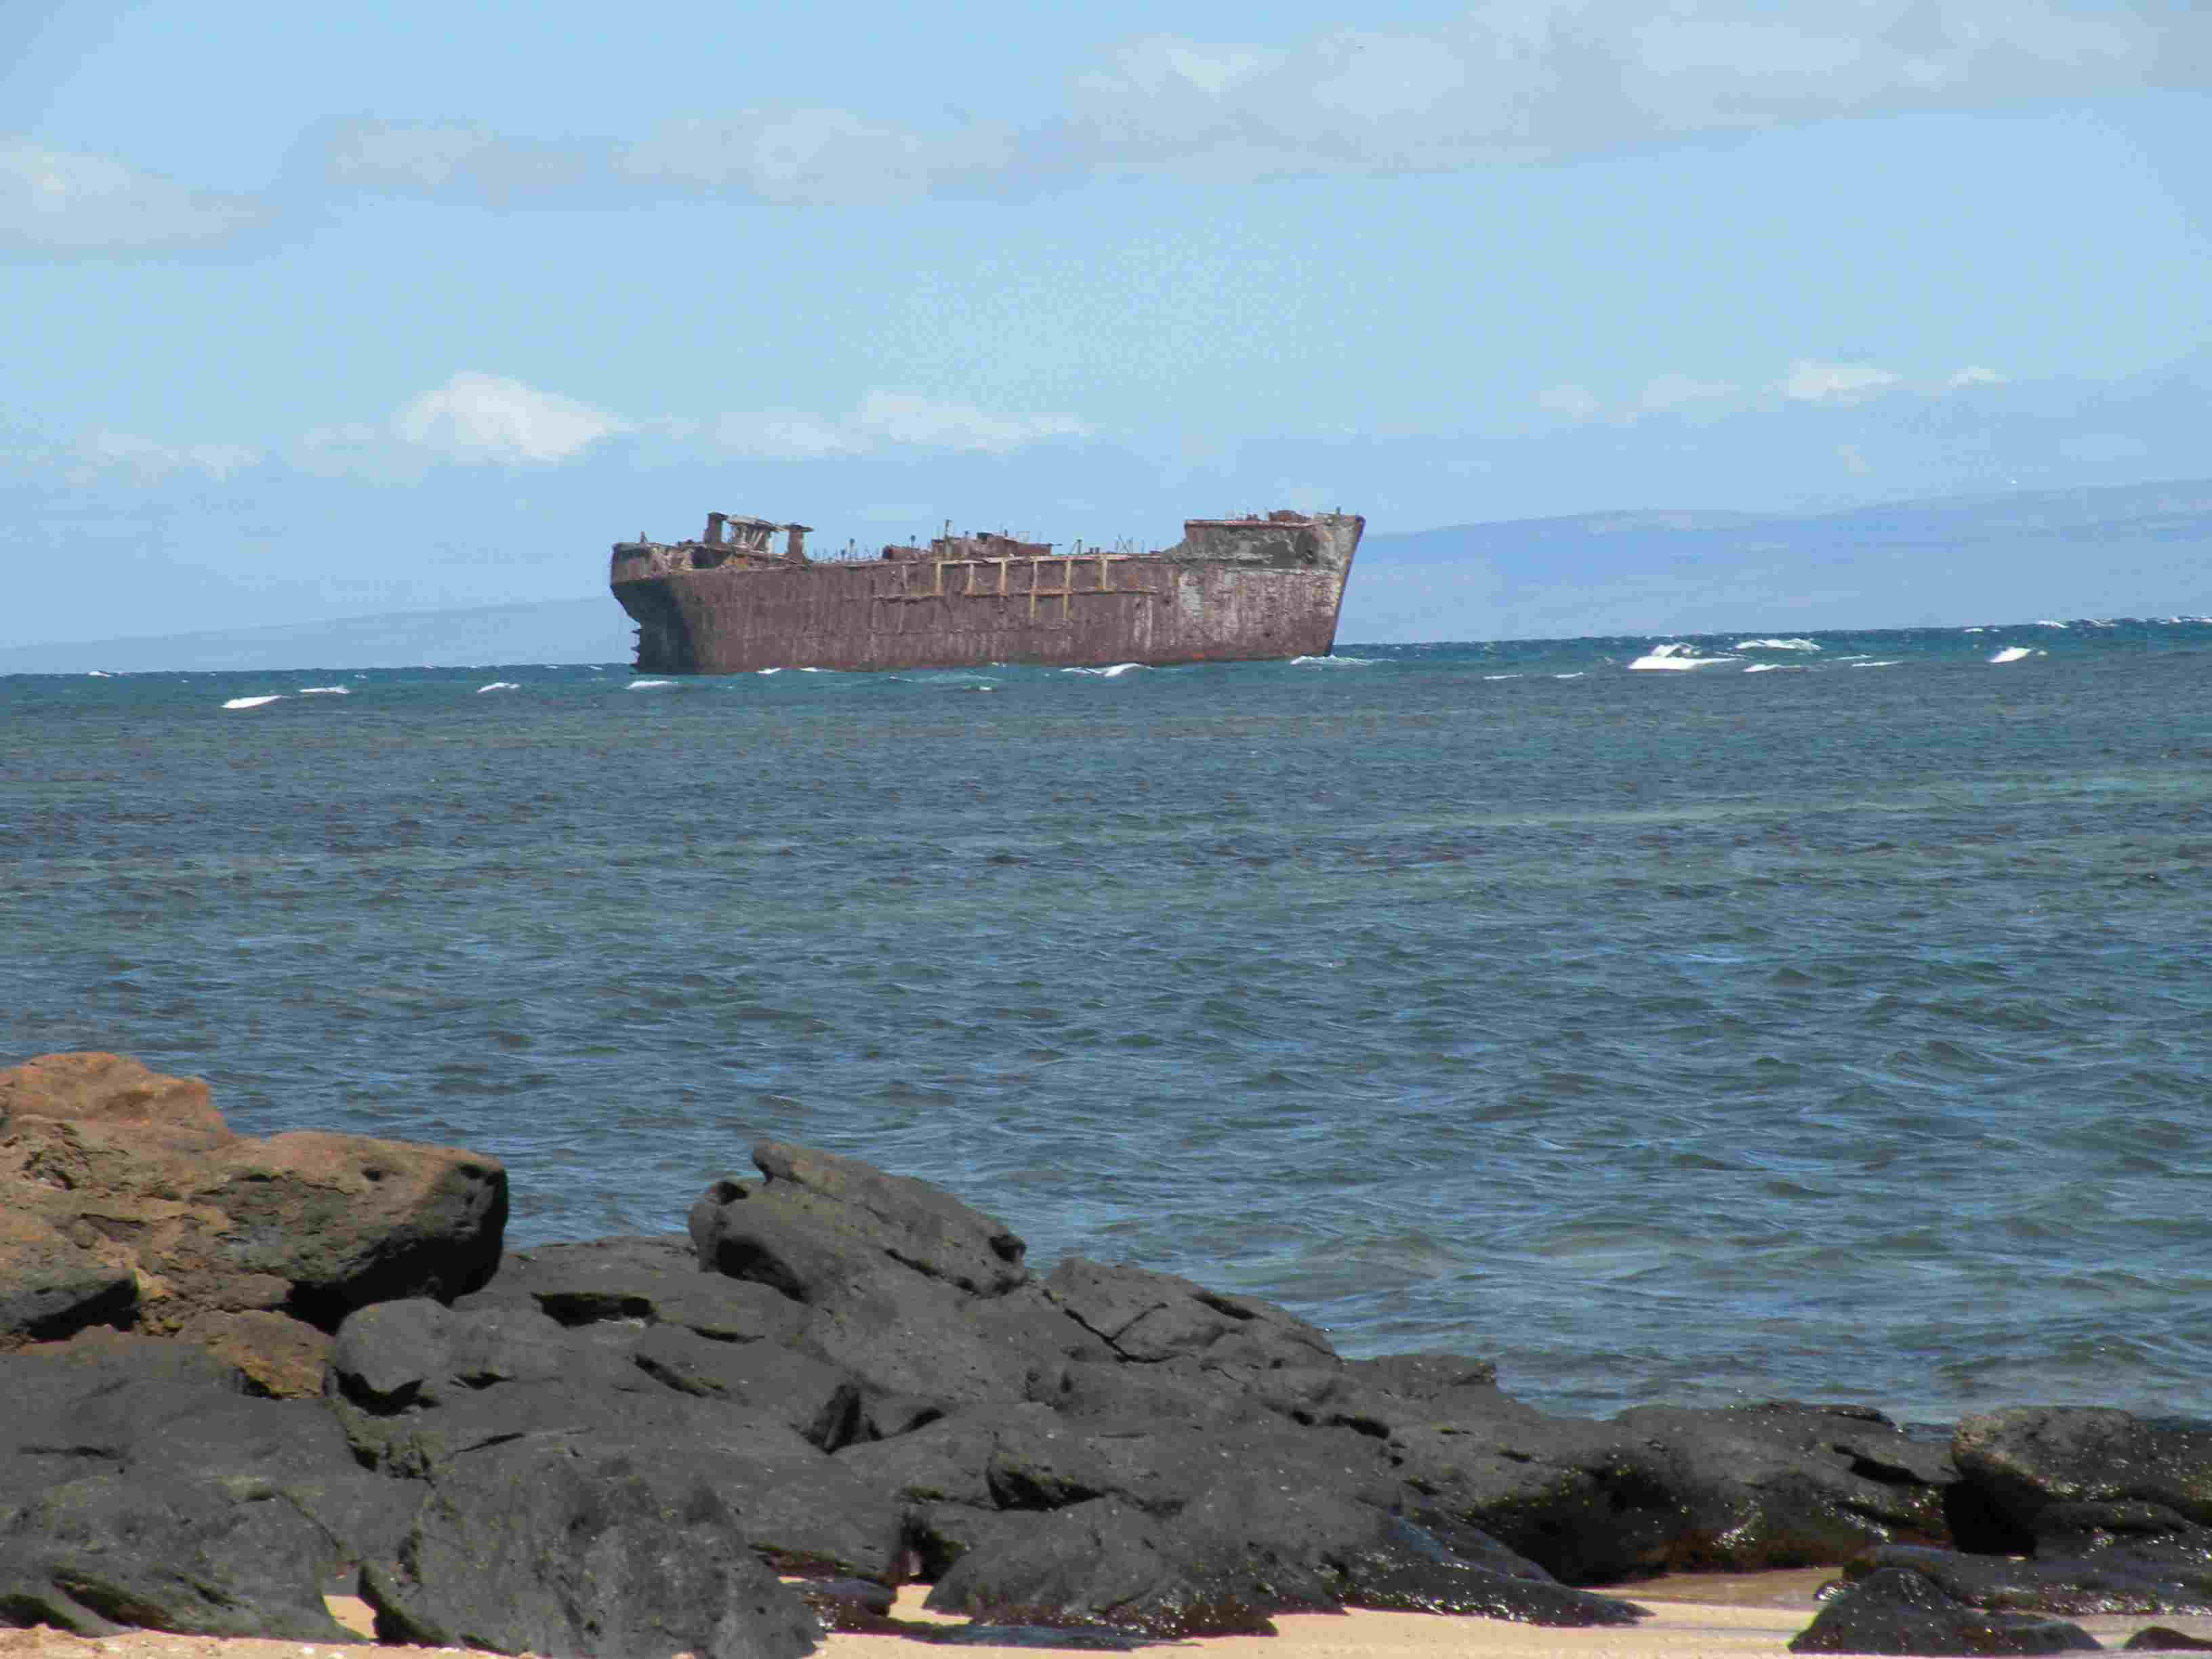 Shipwreck Beach in Hawaii.